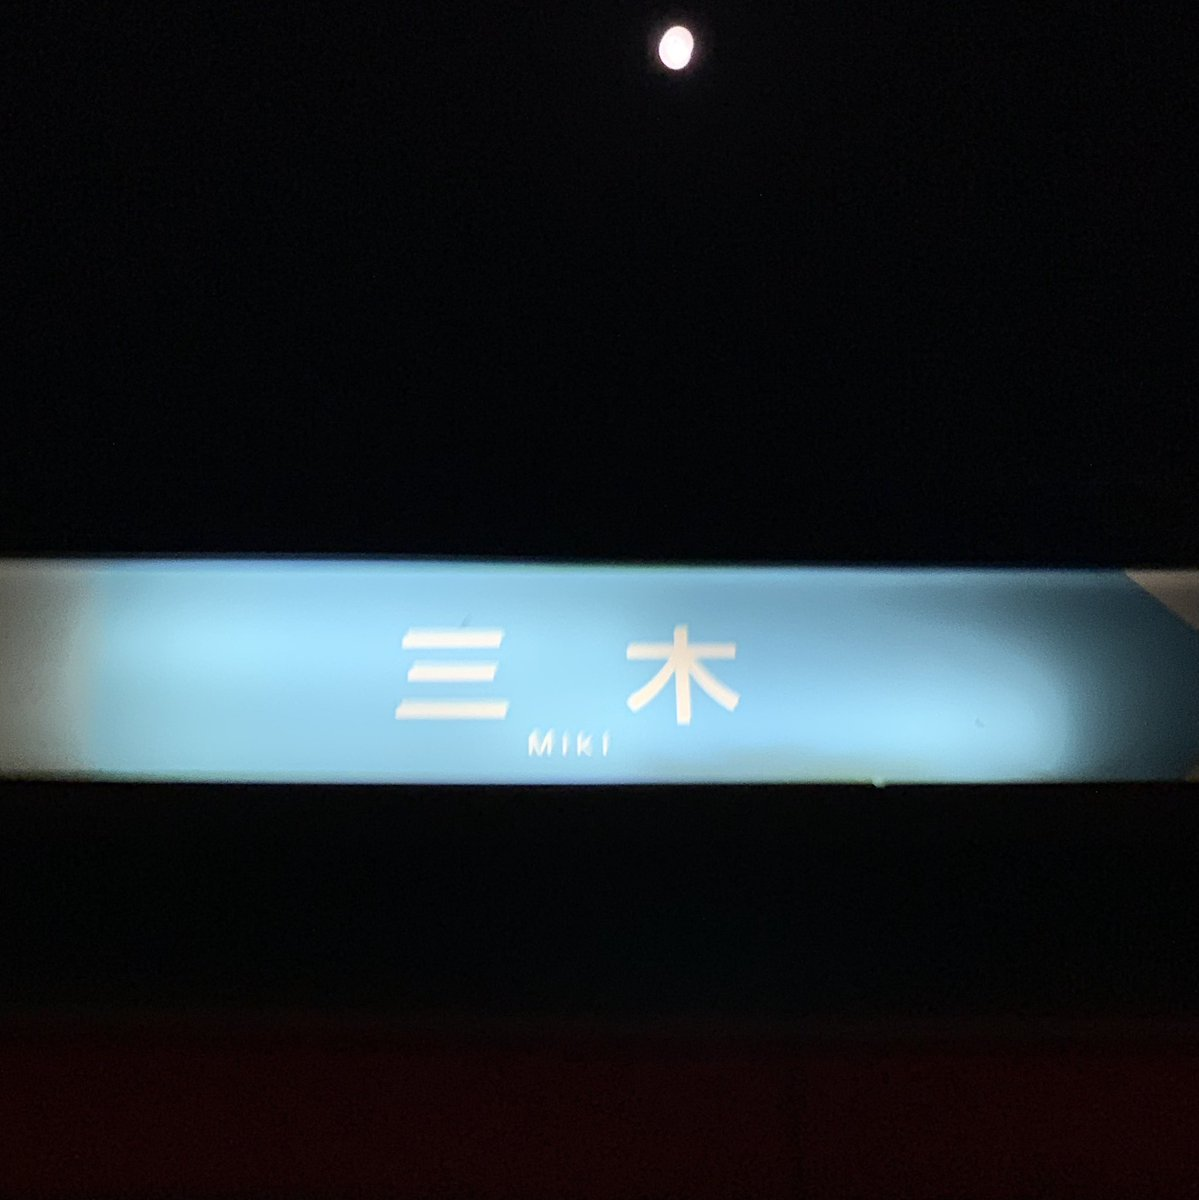 test ツイッターメディア - [第1チェックポイント]三木SA 赤福最終販売店舗のようで赤福推しがすごい https://t.co/E8JIaF7gvY